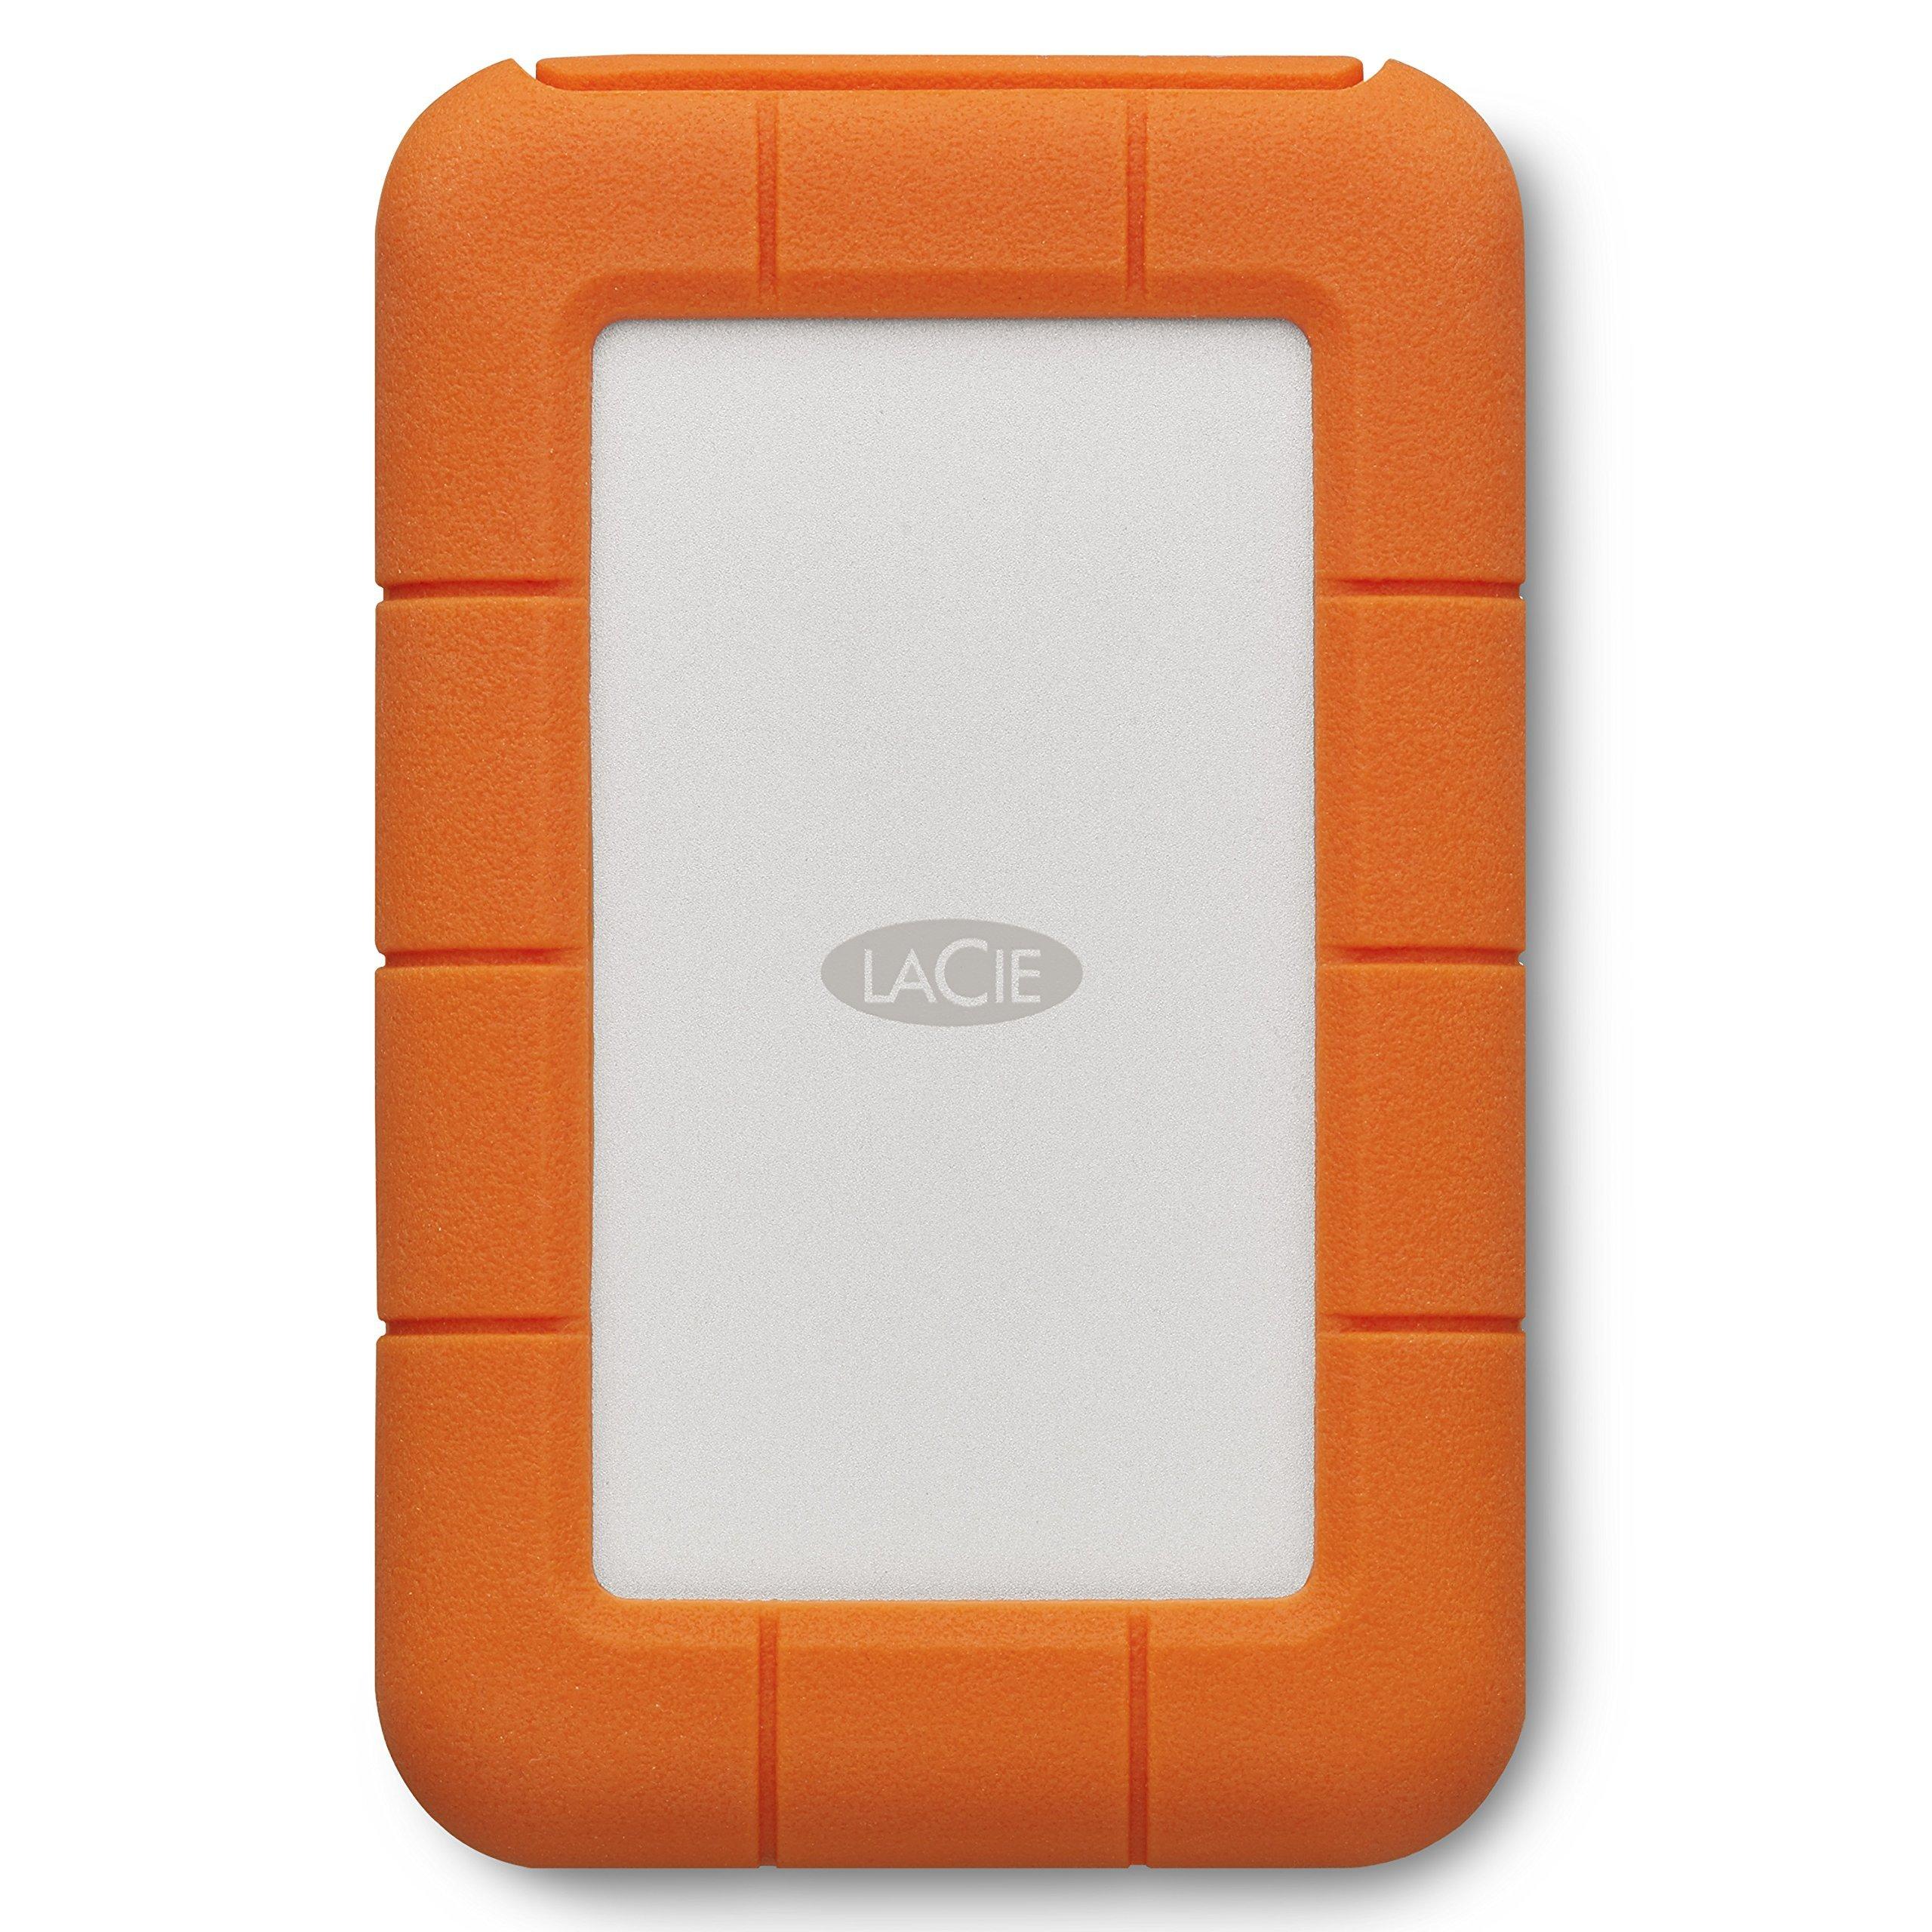 LaCie Rugged 2TB Thunderbolt USB-C Portable Hard Drive (STFS2000800) (Renewed) by LaCie (Image #4)